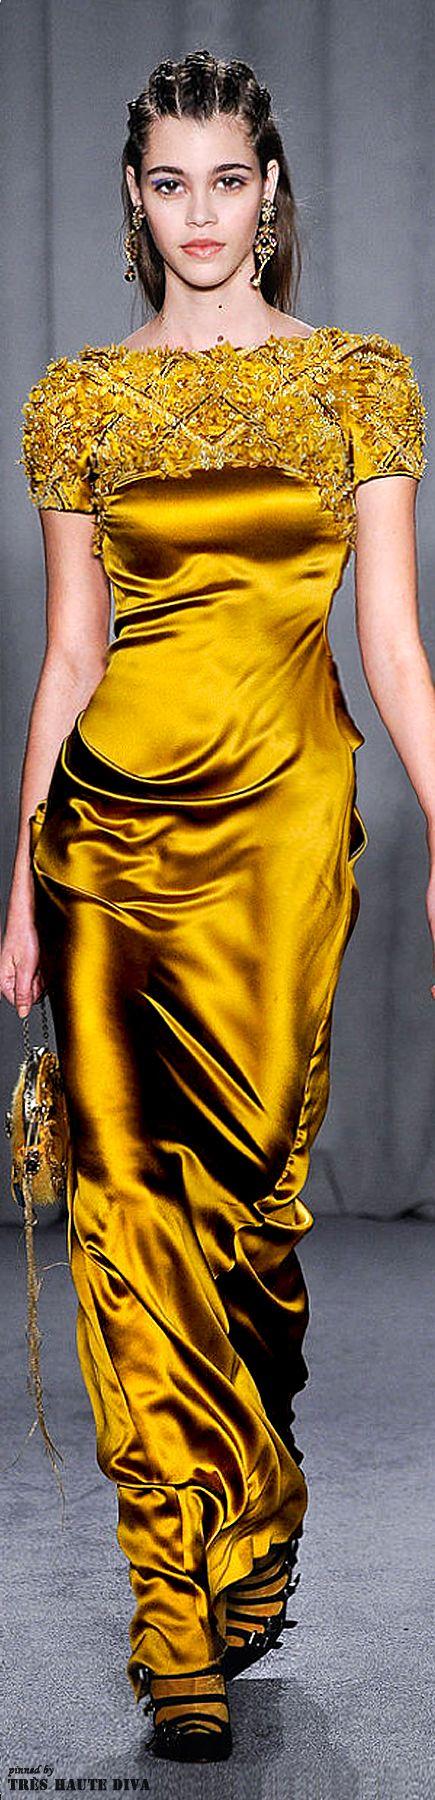 ♕Simply divine #couture ∗ glitz ∗ fashion ∗ yellow ~ dress ~ Marchesa  Fall/Winter 2014-15